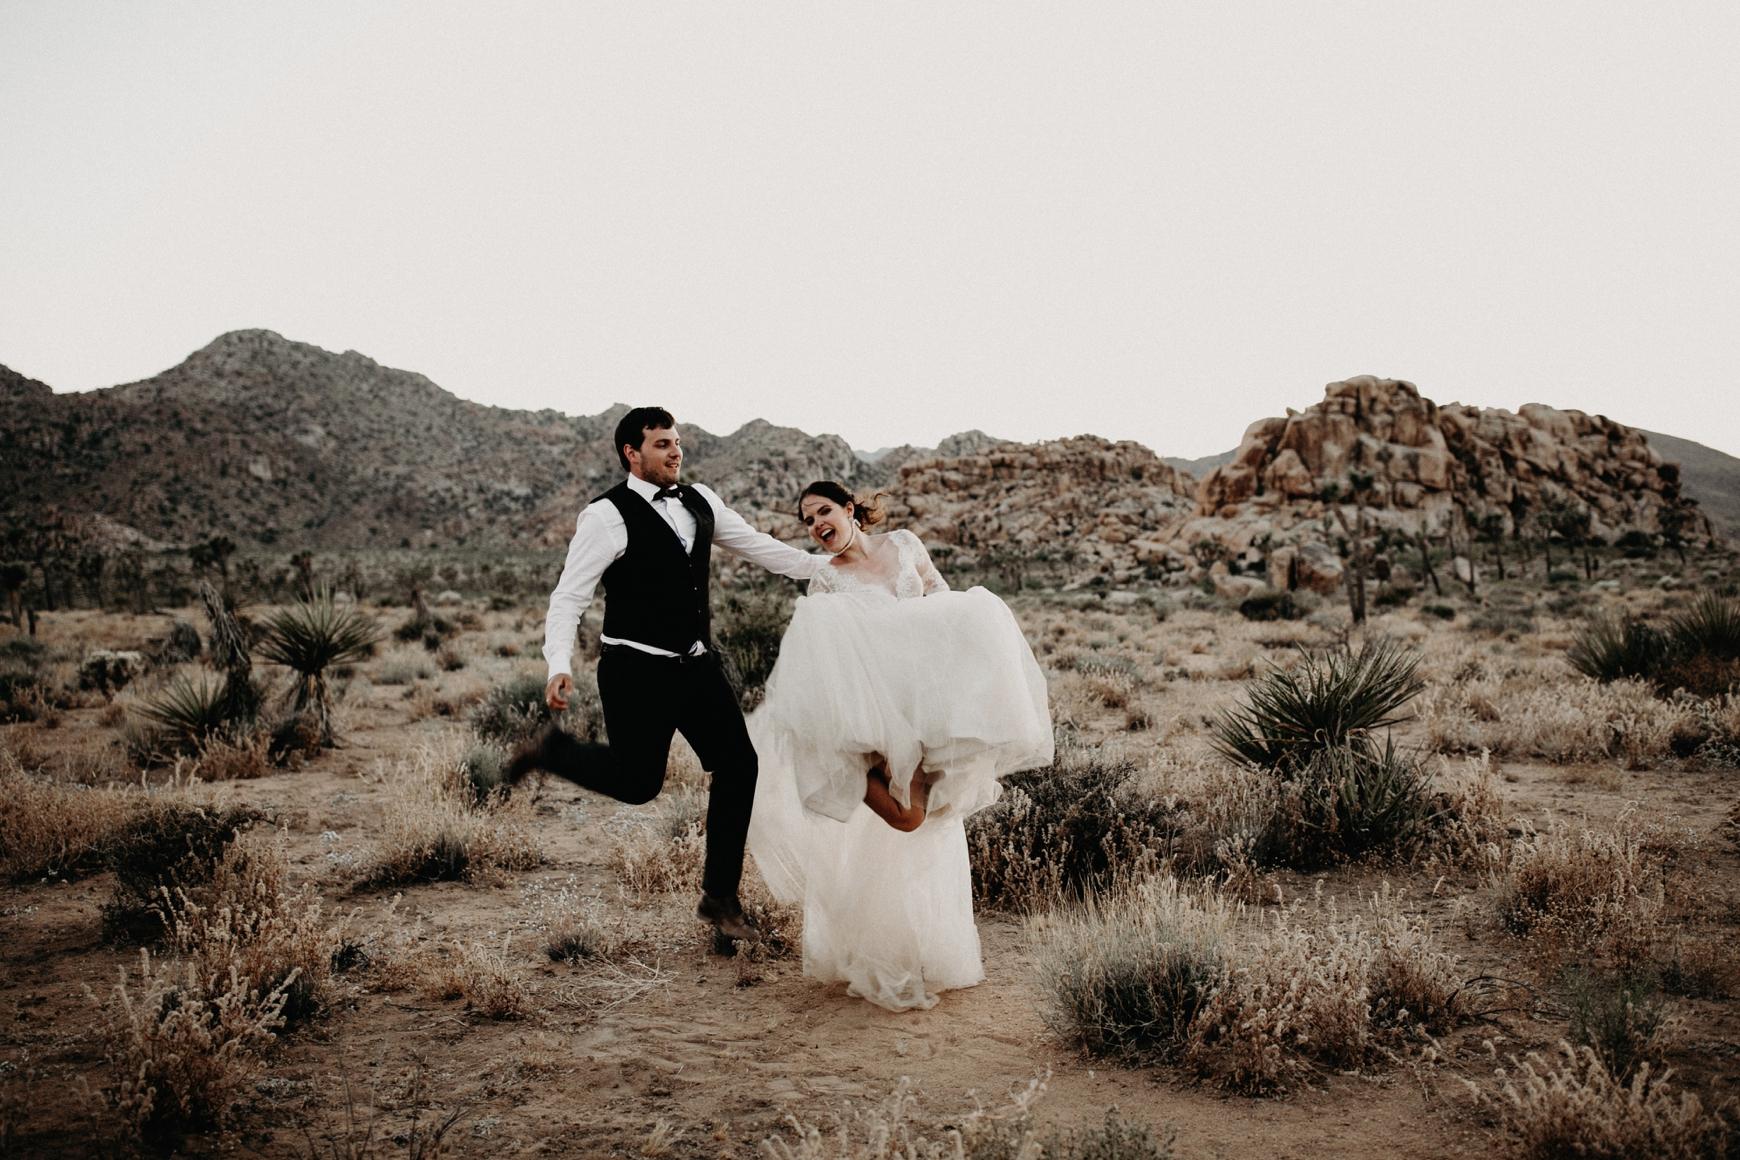 Joshua Tree Bridal Portraits Anastasia & Andrey Emily Magers Photography-401.jpg